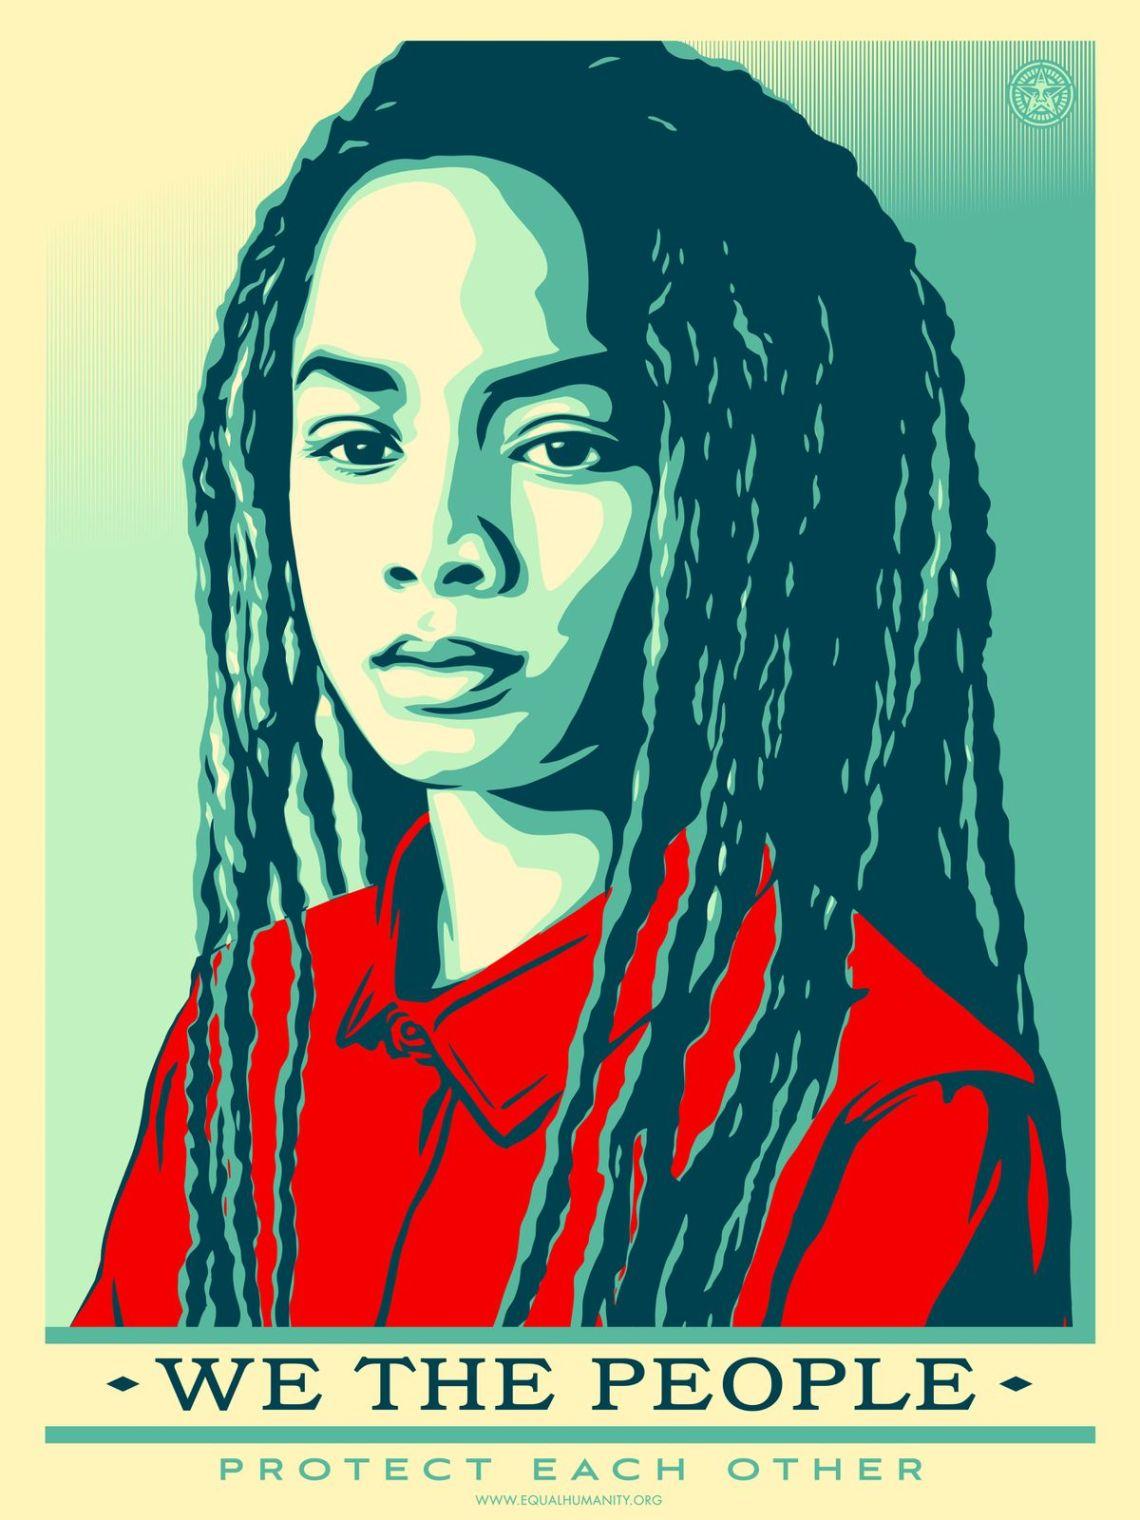 3-obama-hope-artist